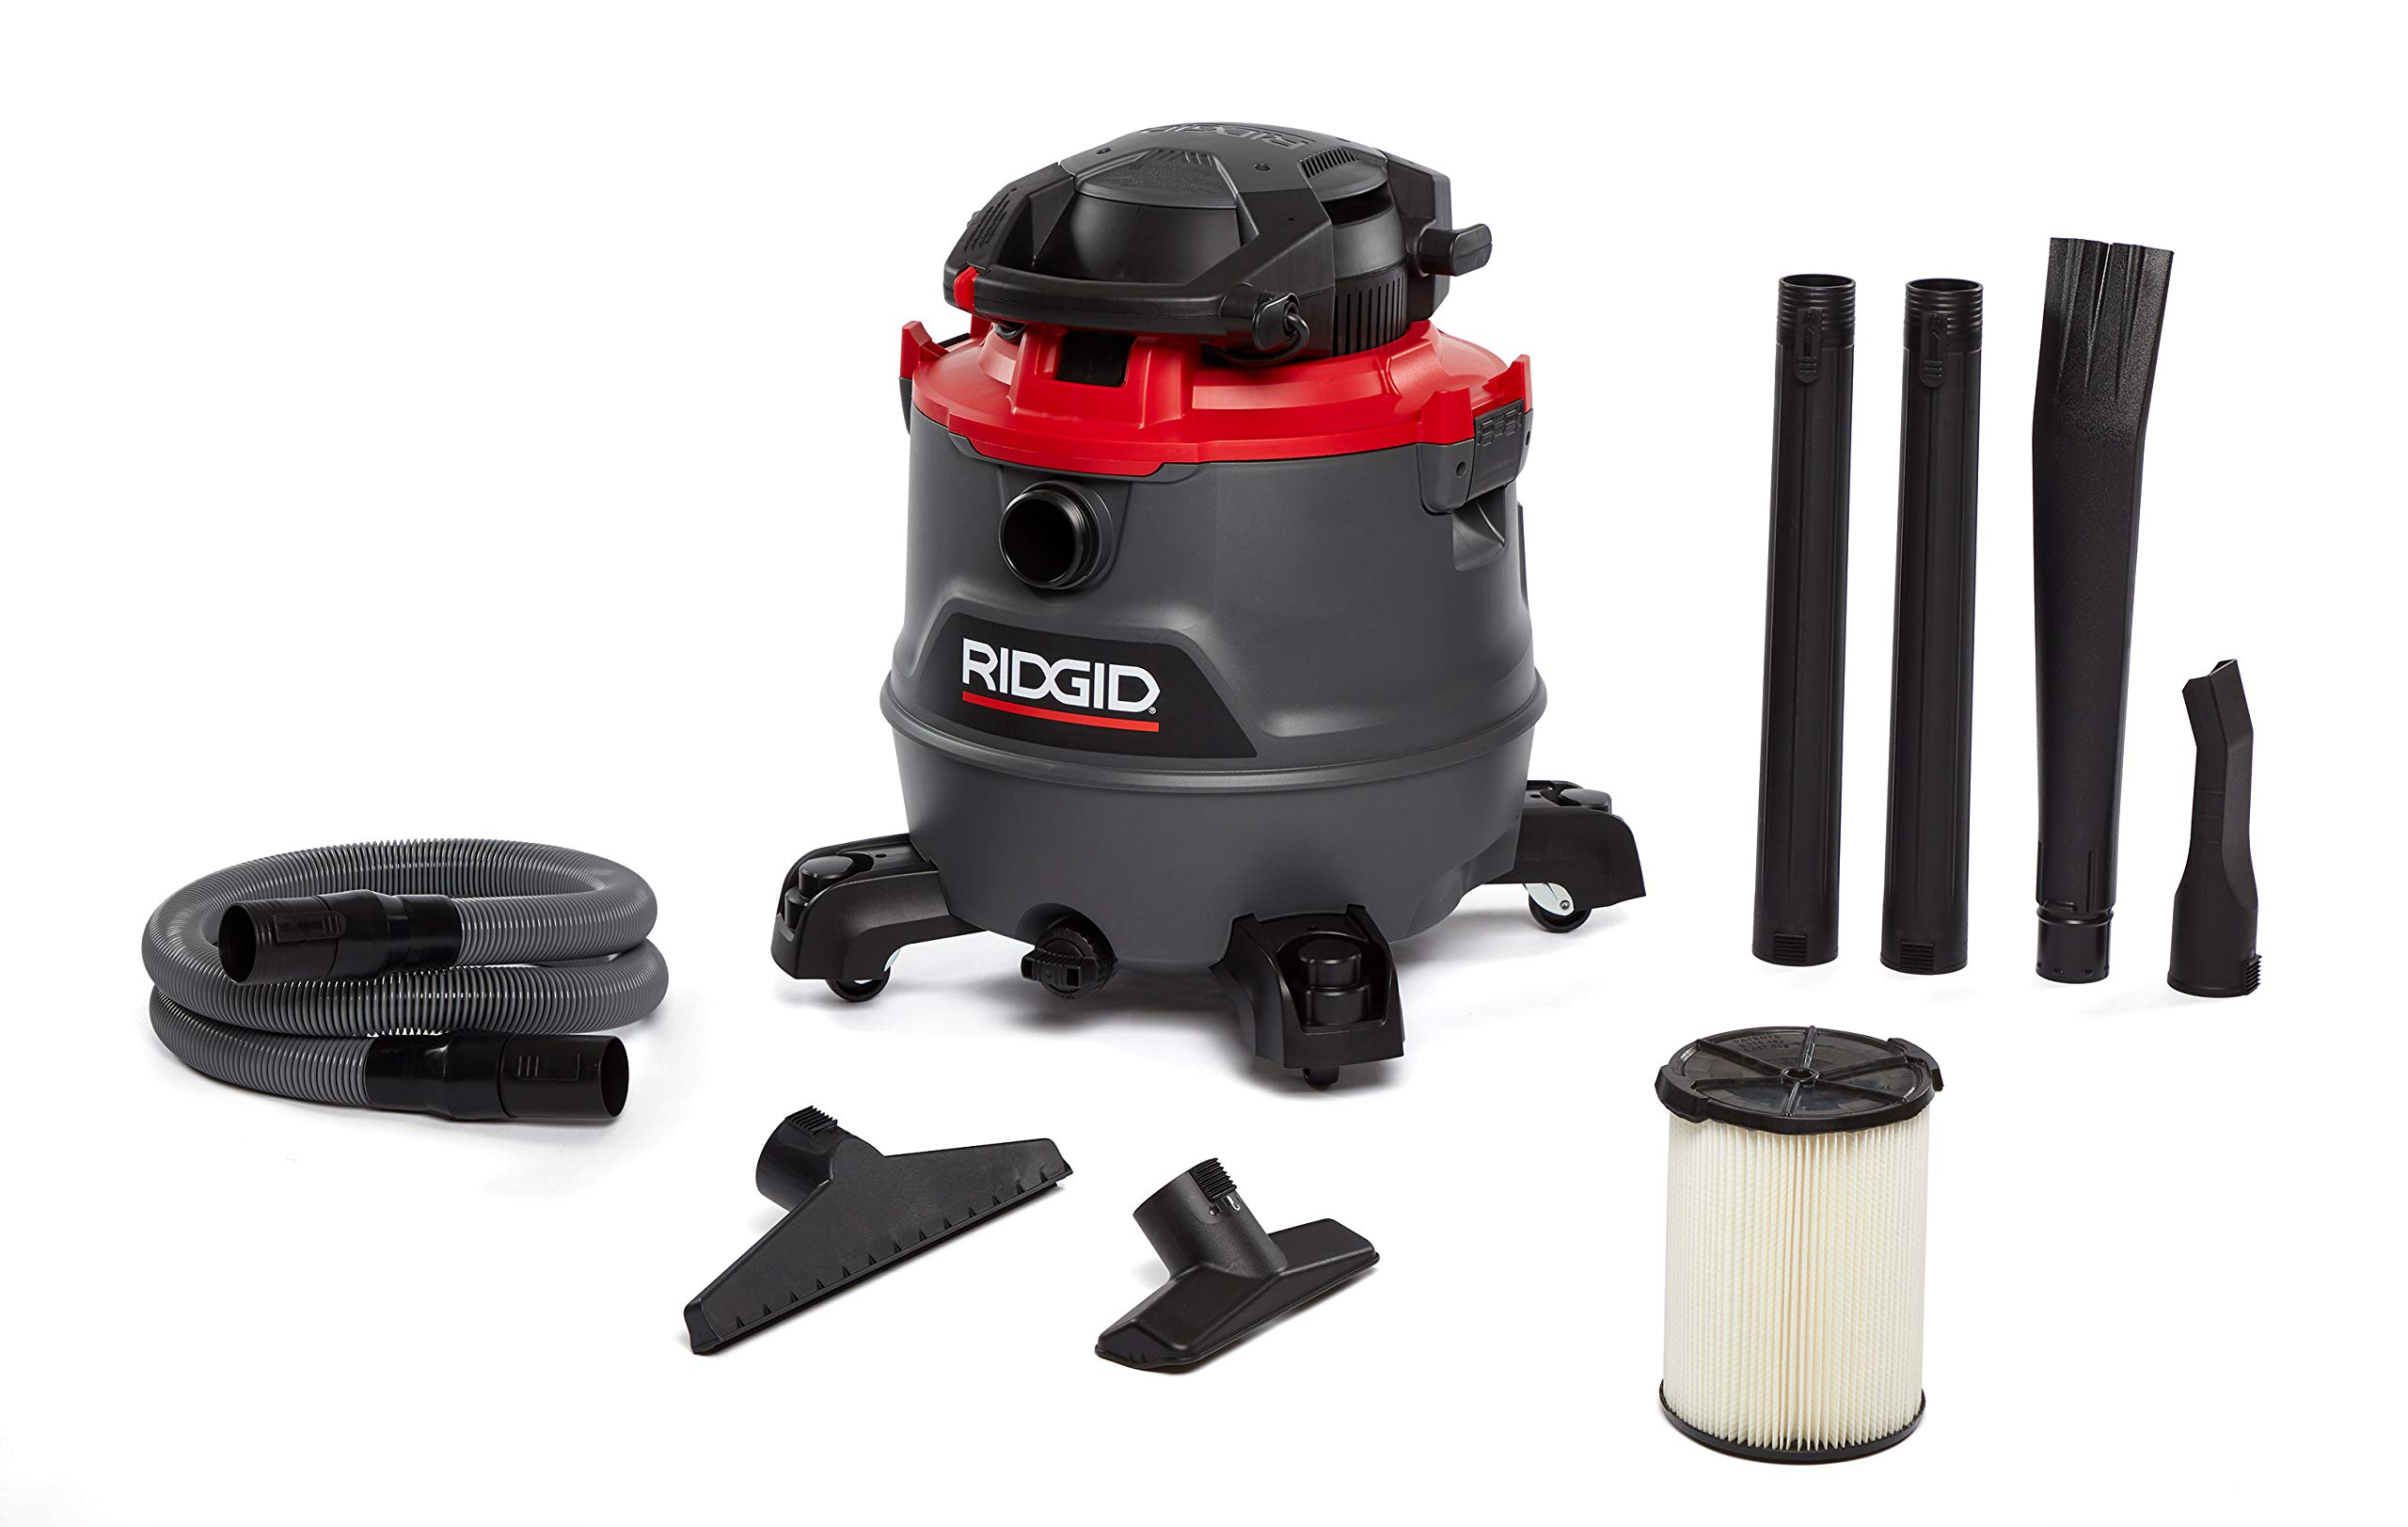 Ridgid 62723 Red 16 gallon RT1600 Wet/Dry Vacuum by Ridgid